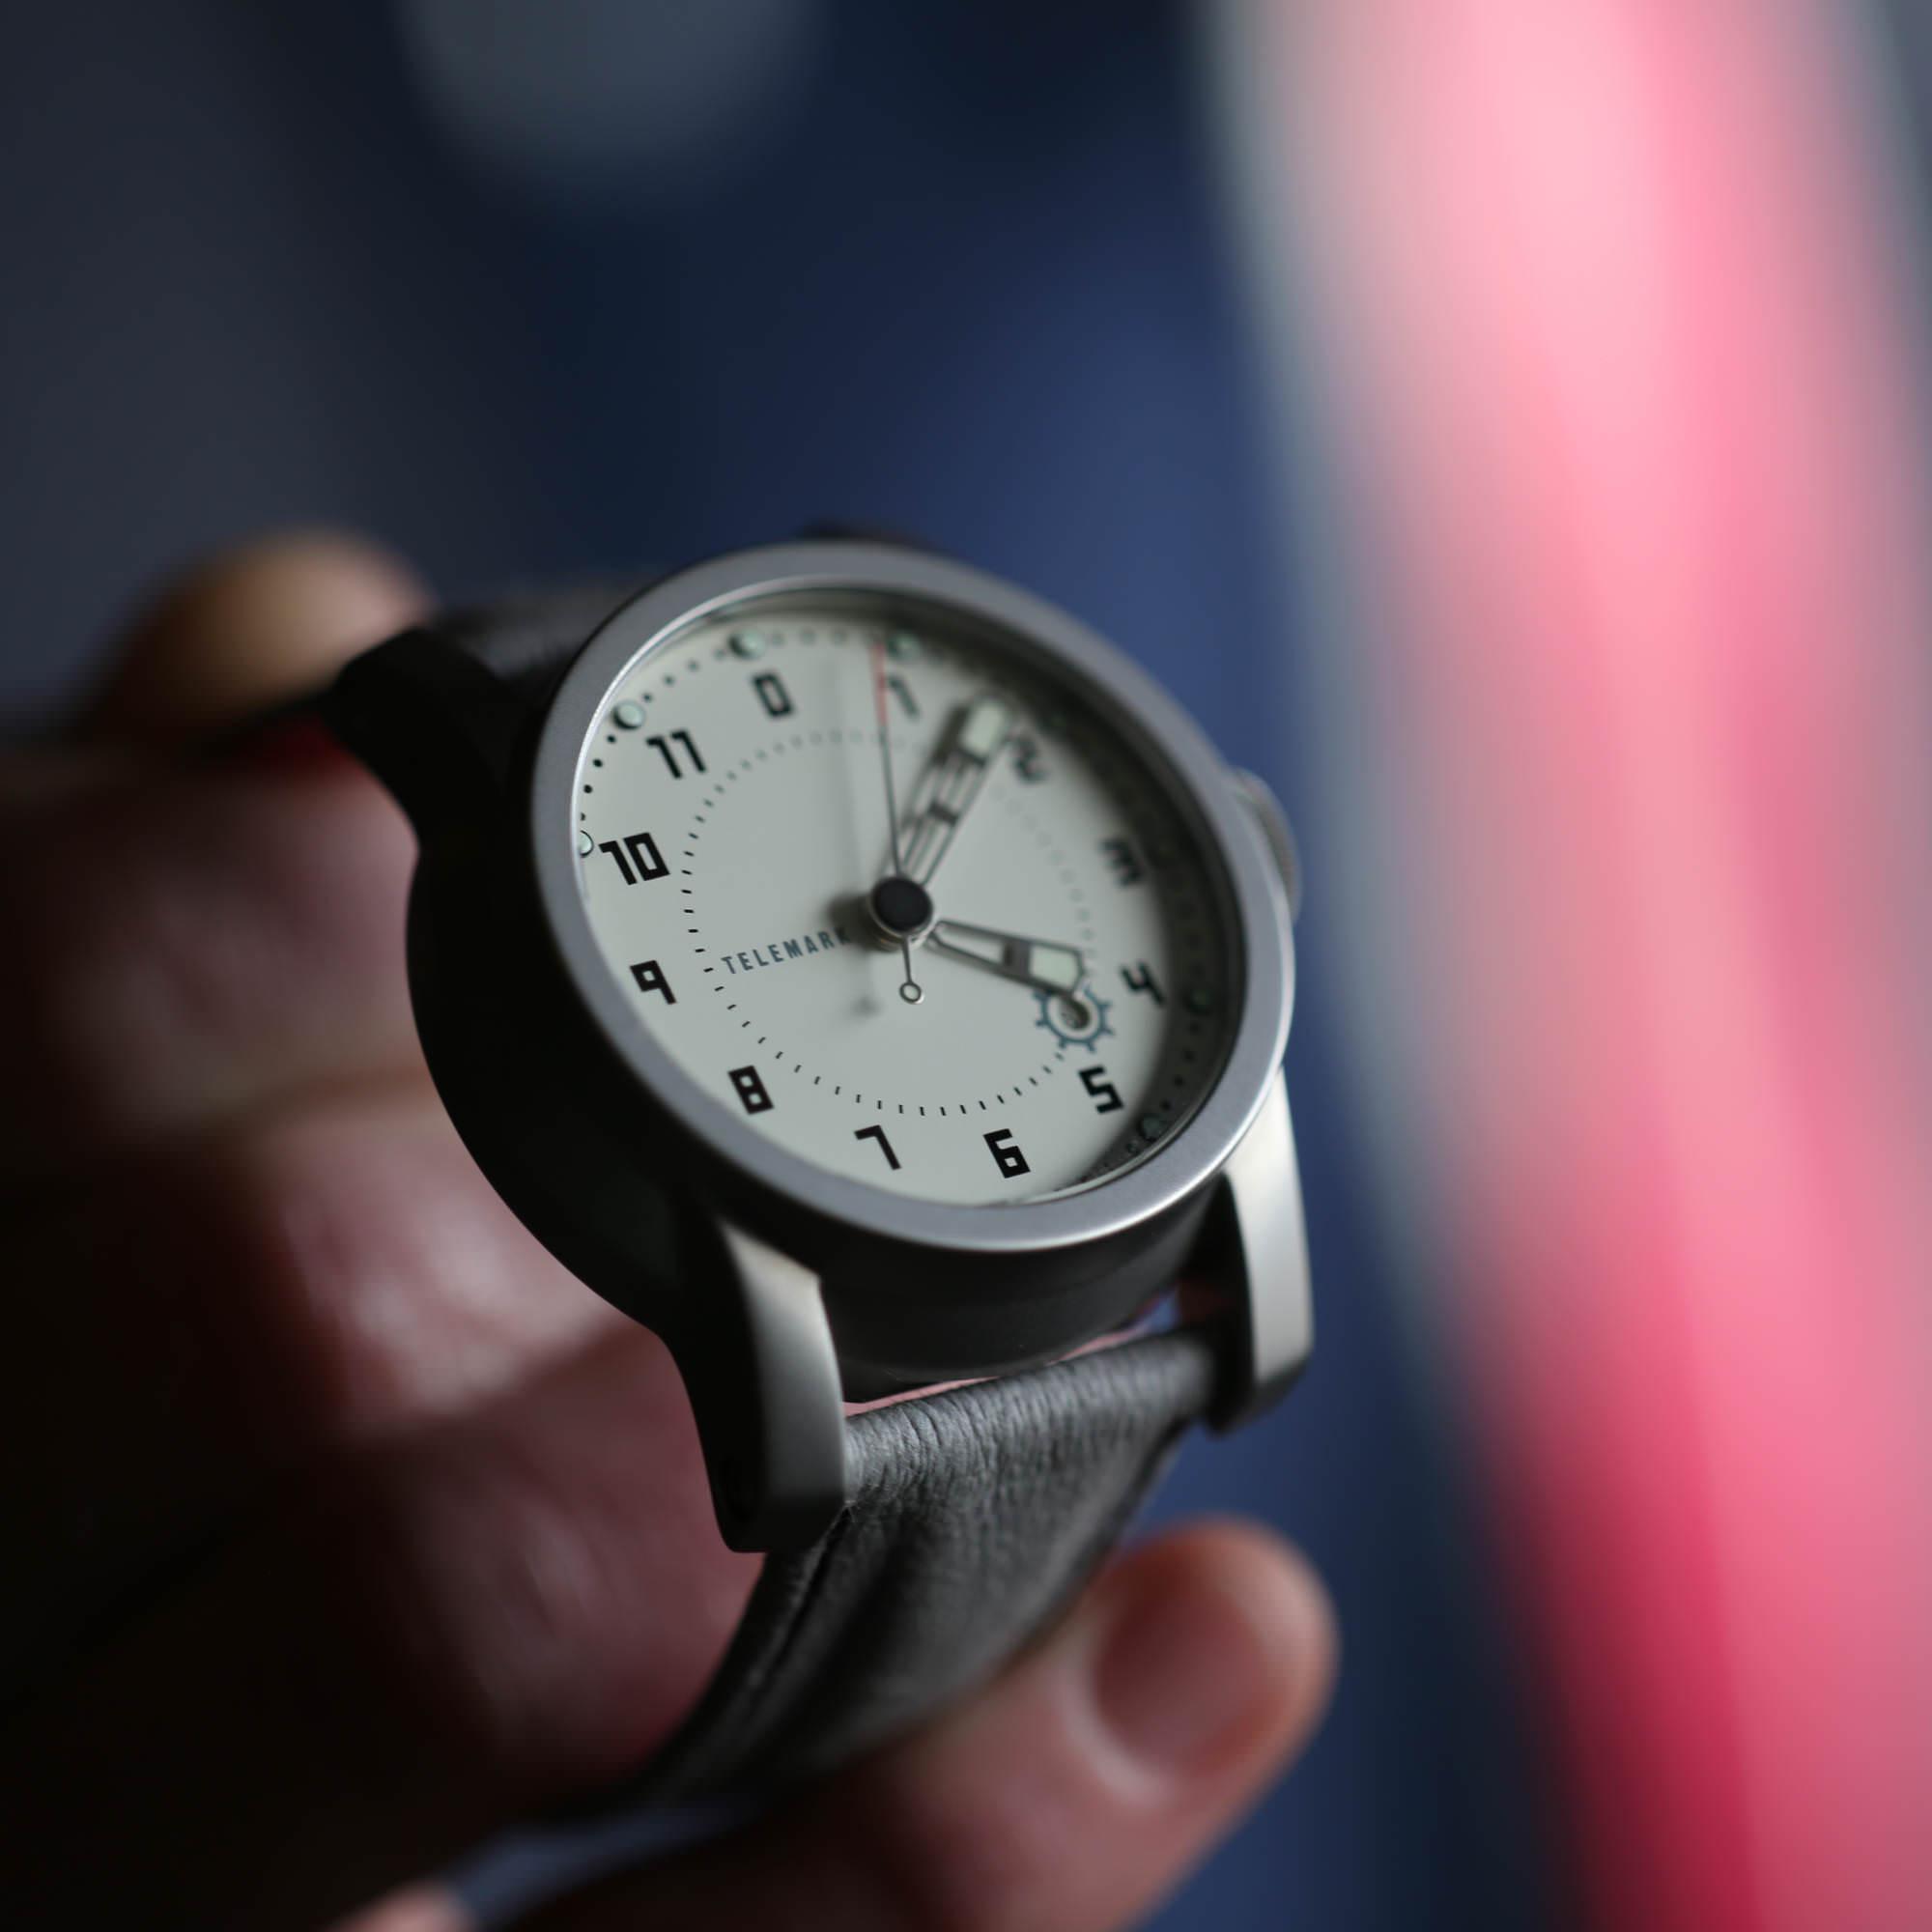 British Watchmaker Schofield Introduces the Telemark